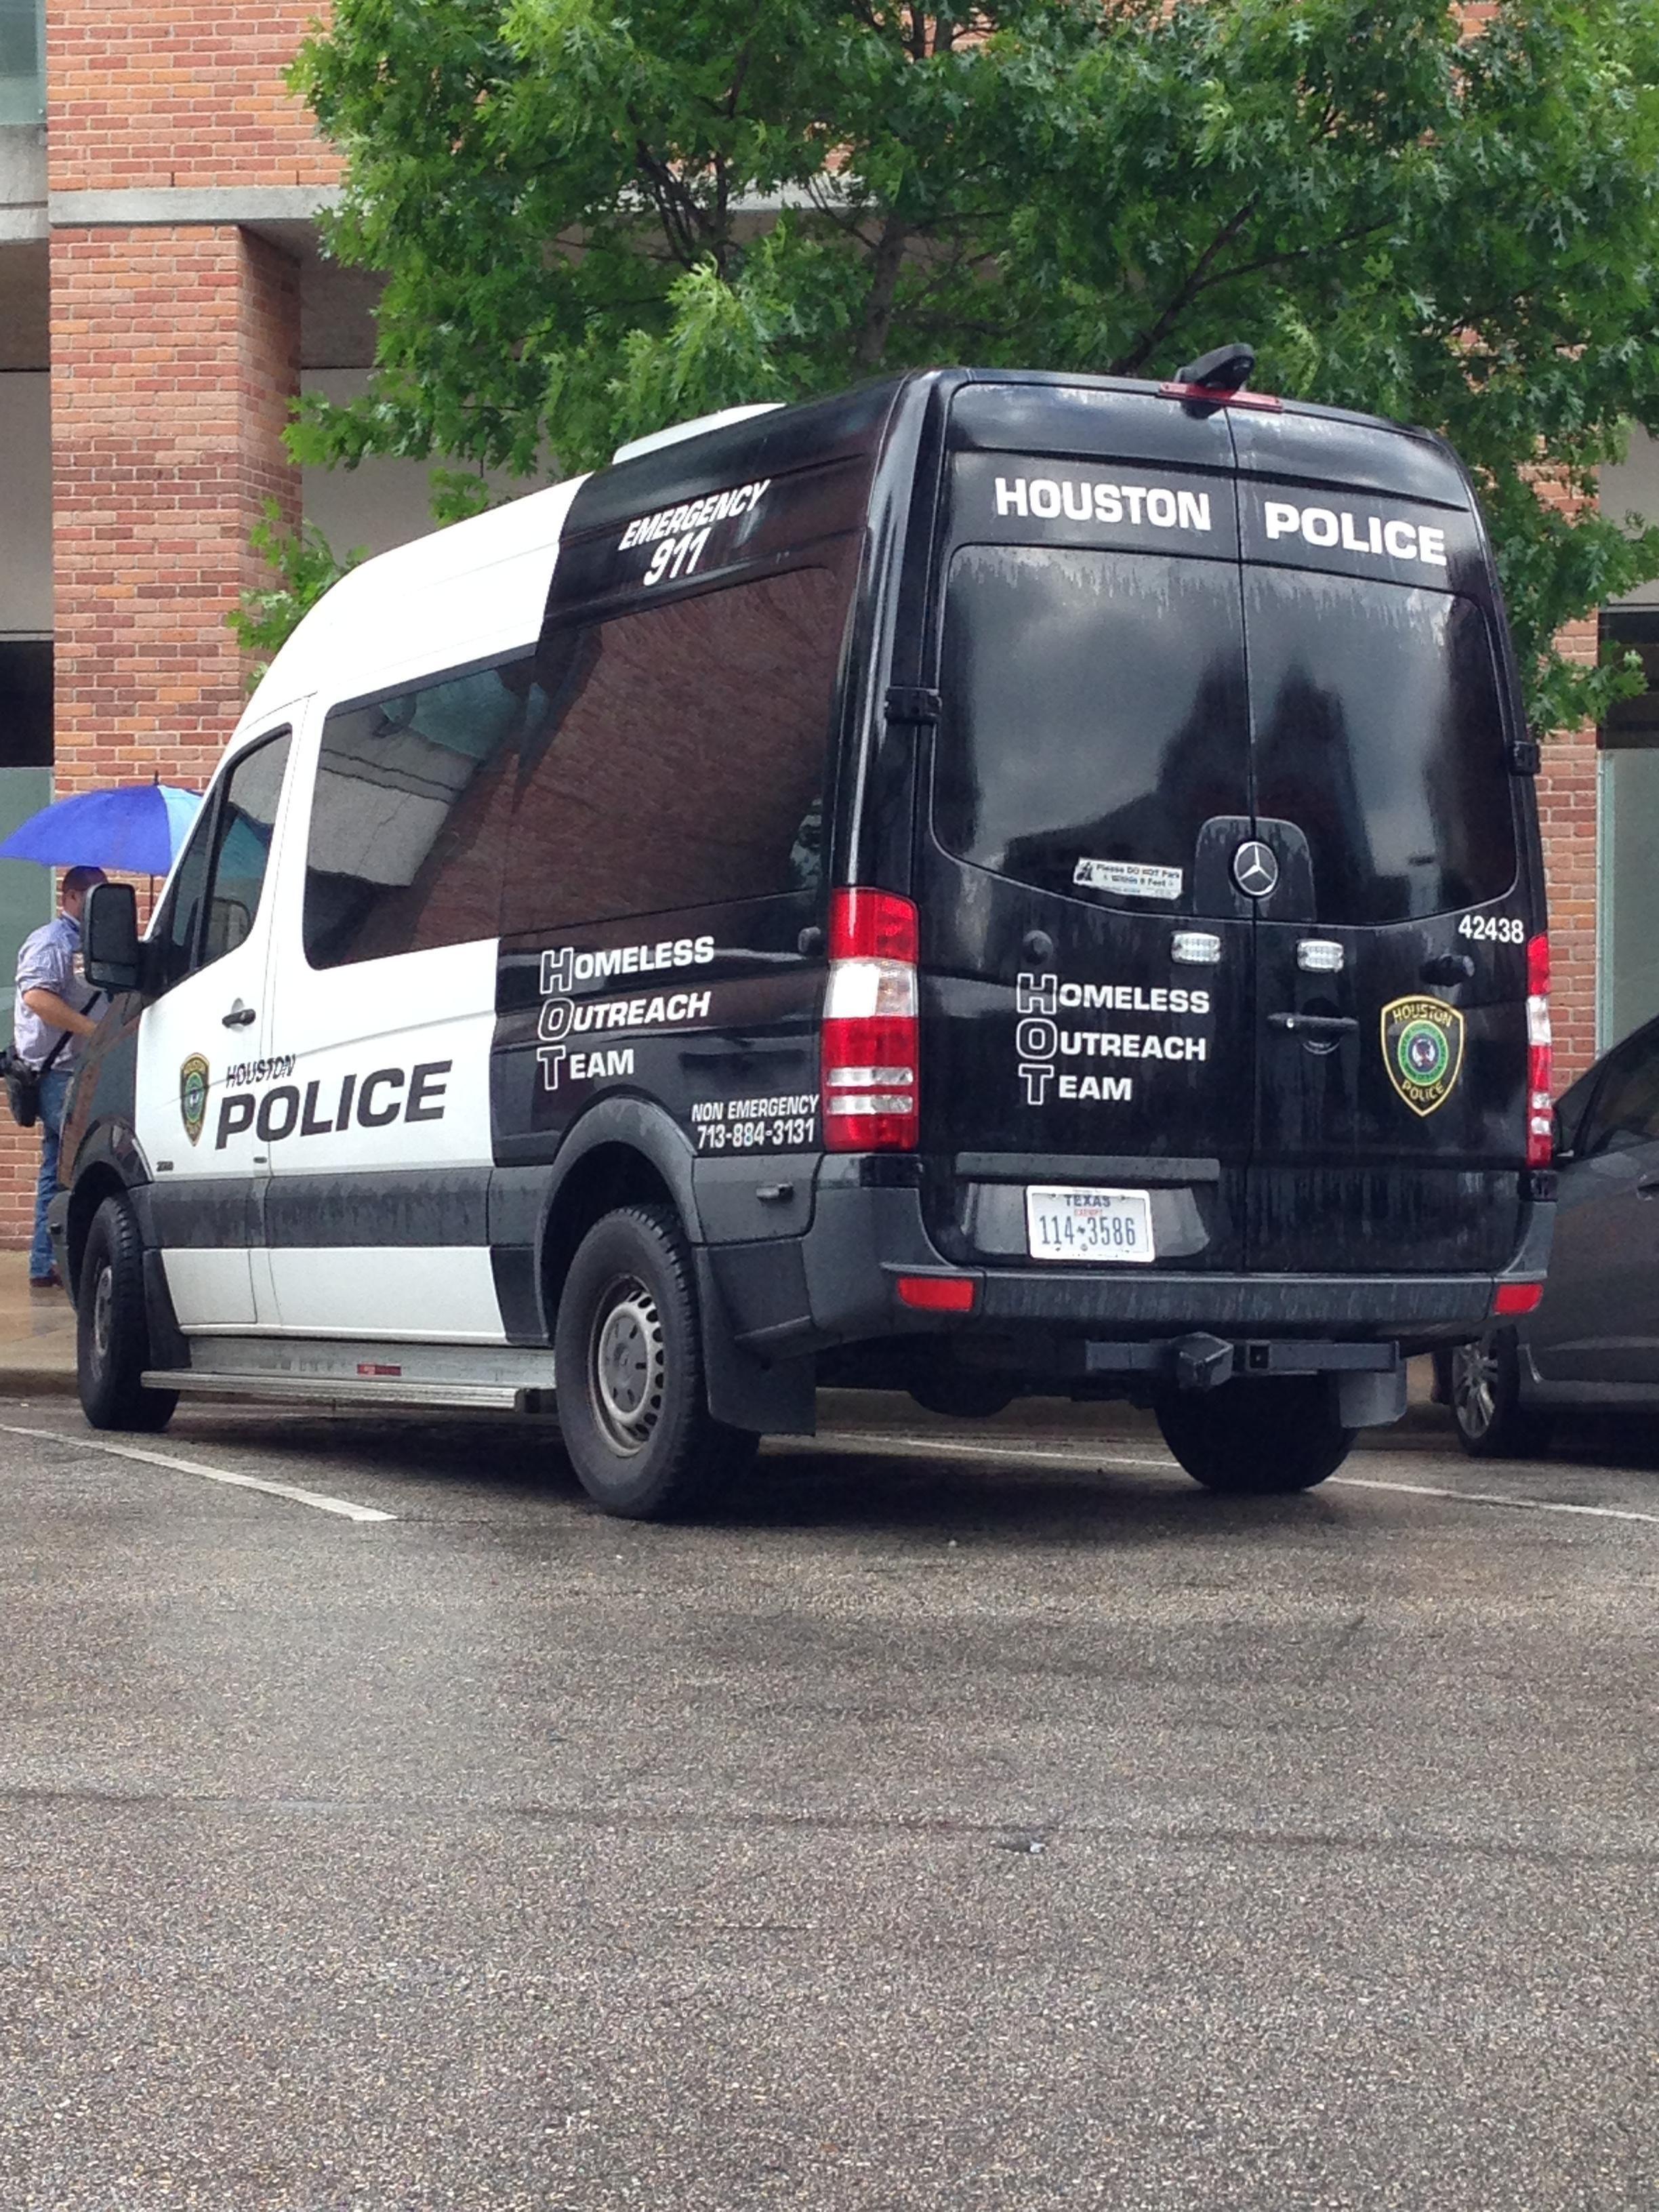 Houston Police Dept Homeless Outreach Team Mercedes Benz Sprinter Houston Police Old Police Cars Police